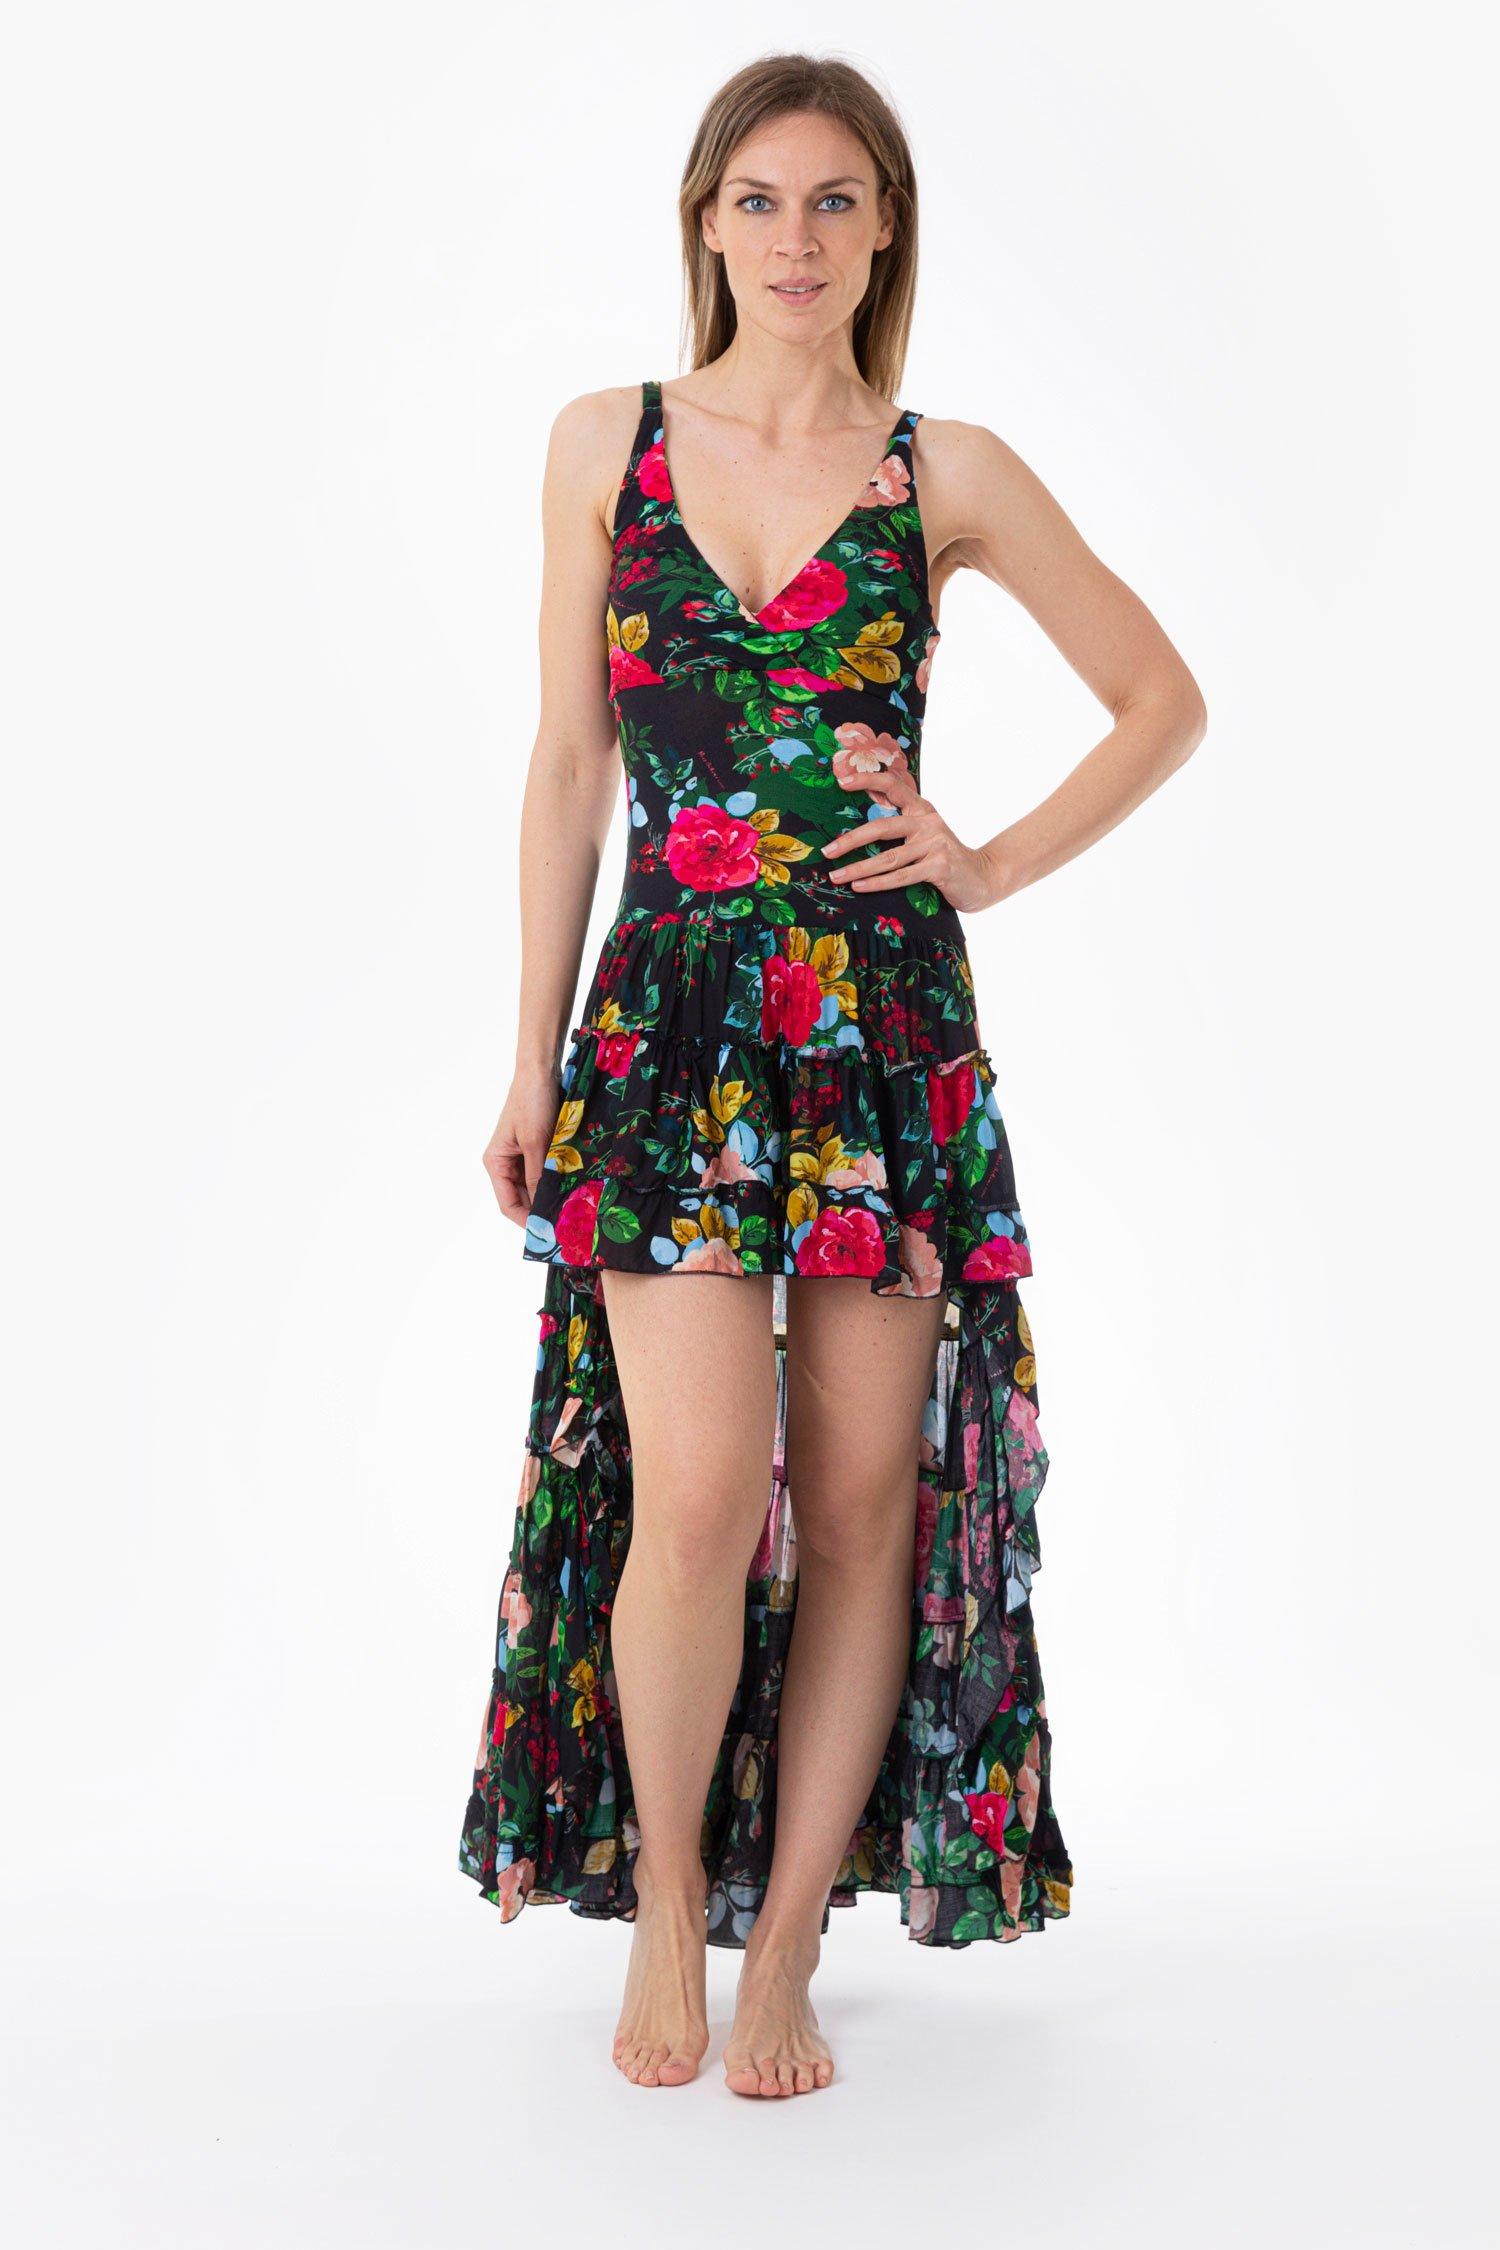 LONG ASYMMETRIC DRESS - Rose Black